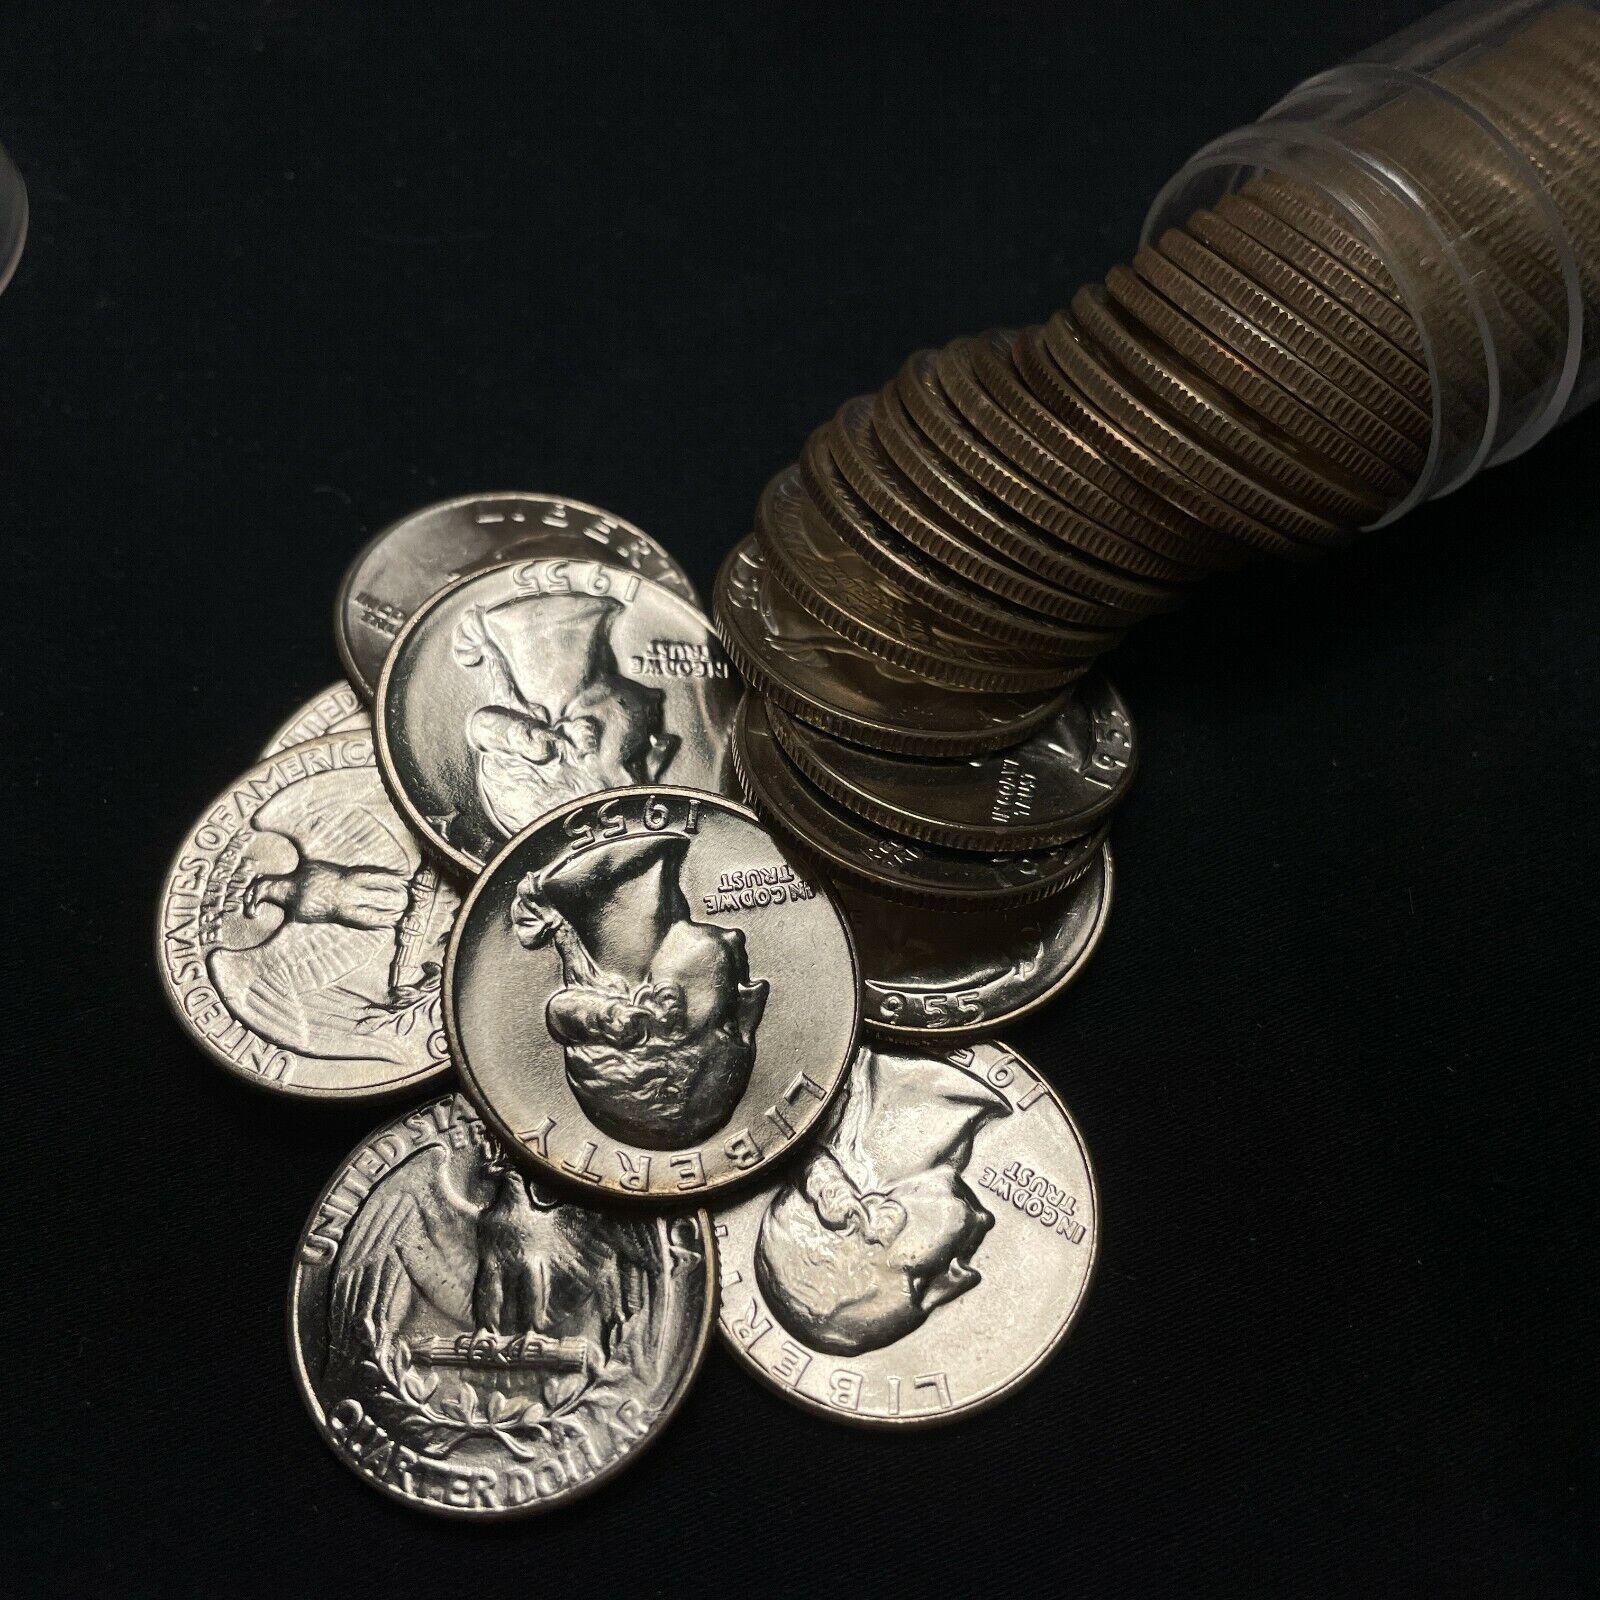 1955-P Uncirculated Washington Silver Quarter Original ROLL, 40 Coins BU A - $315.00